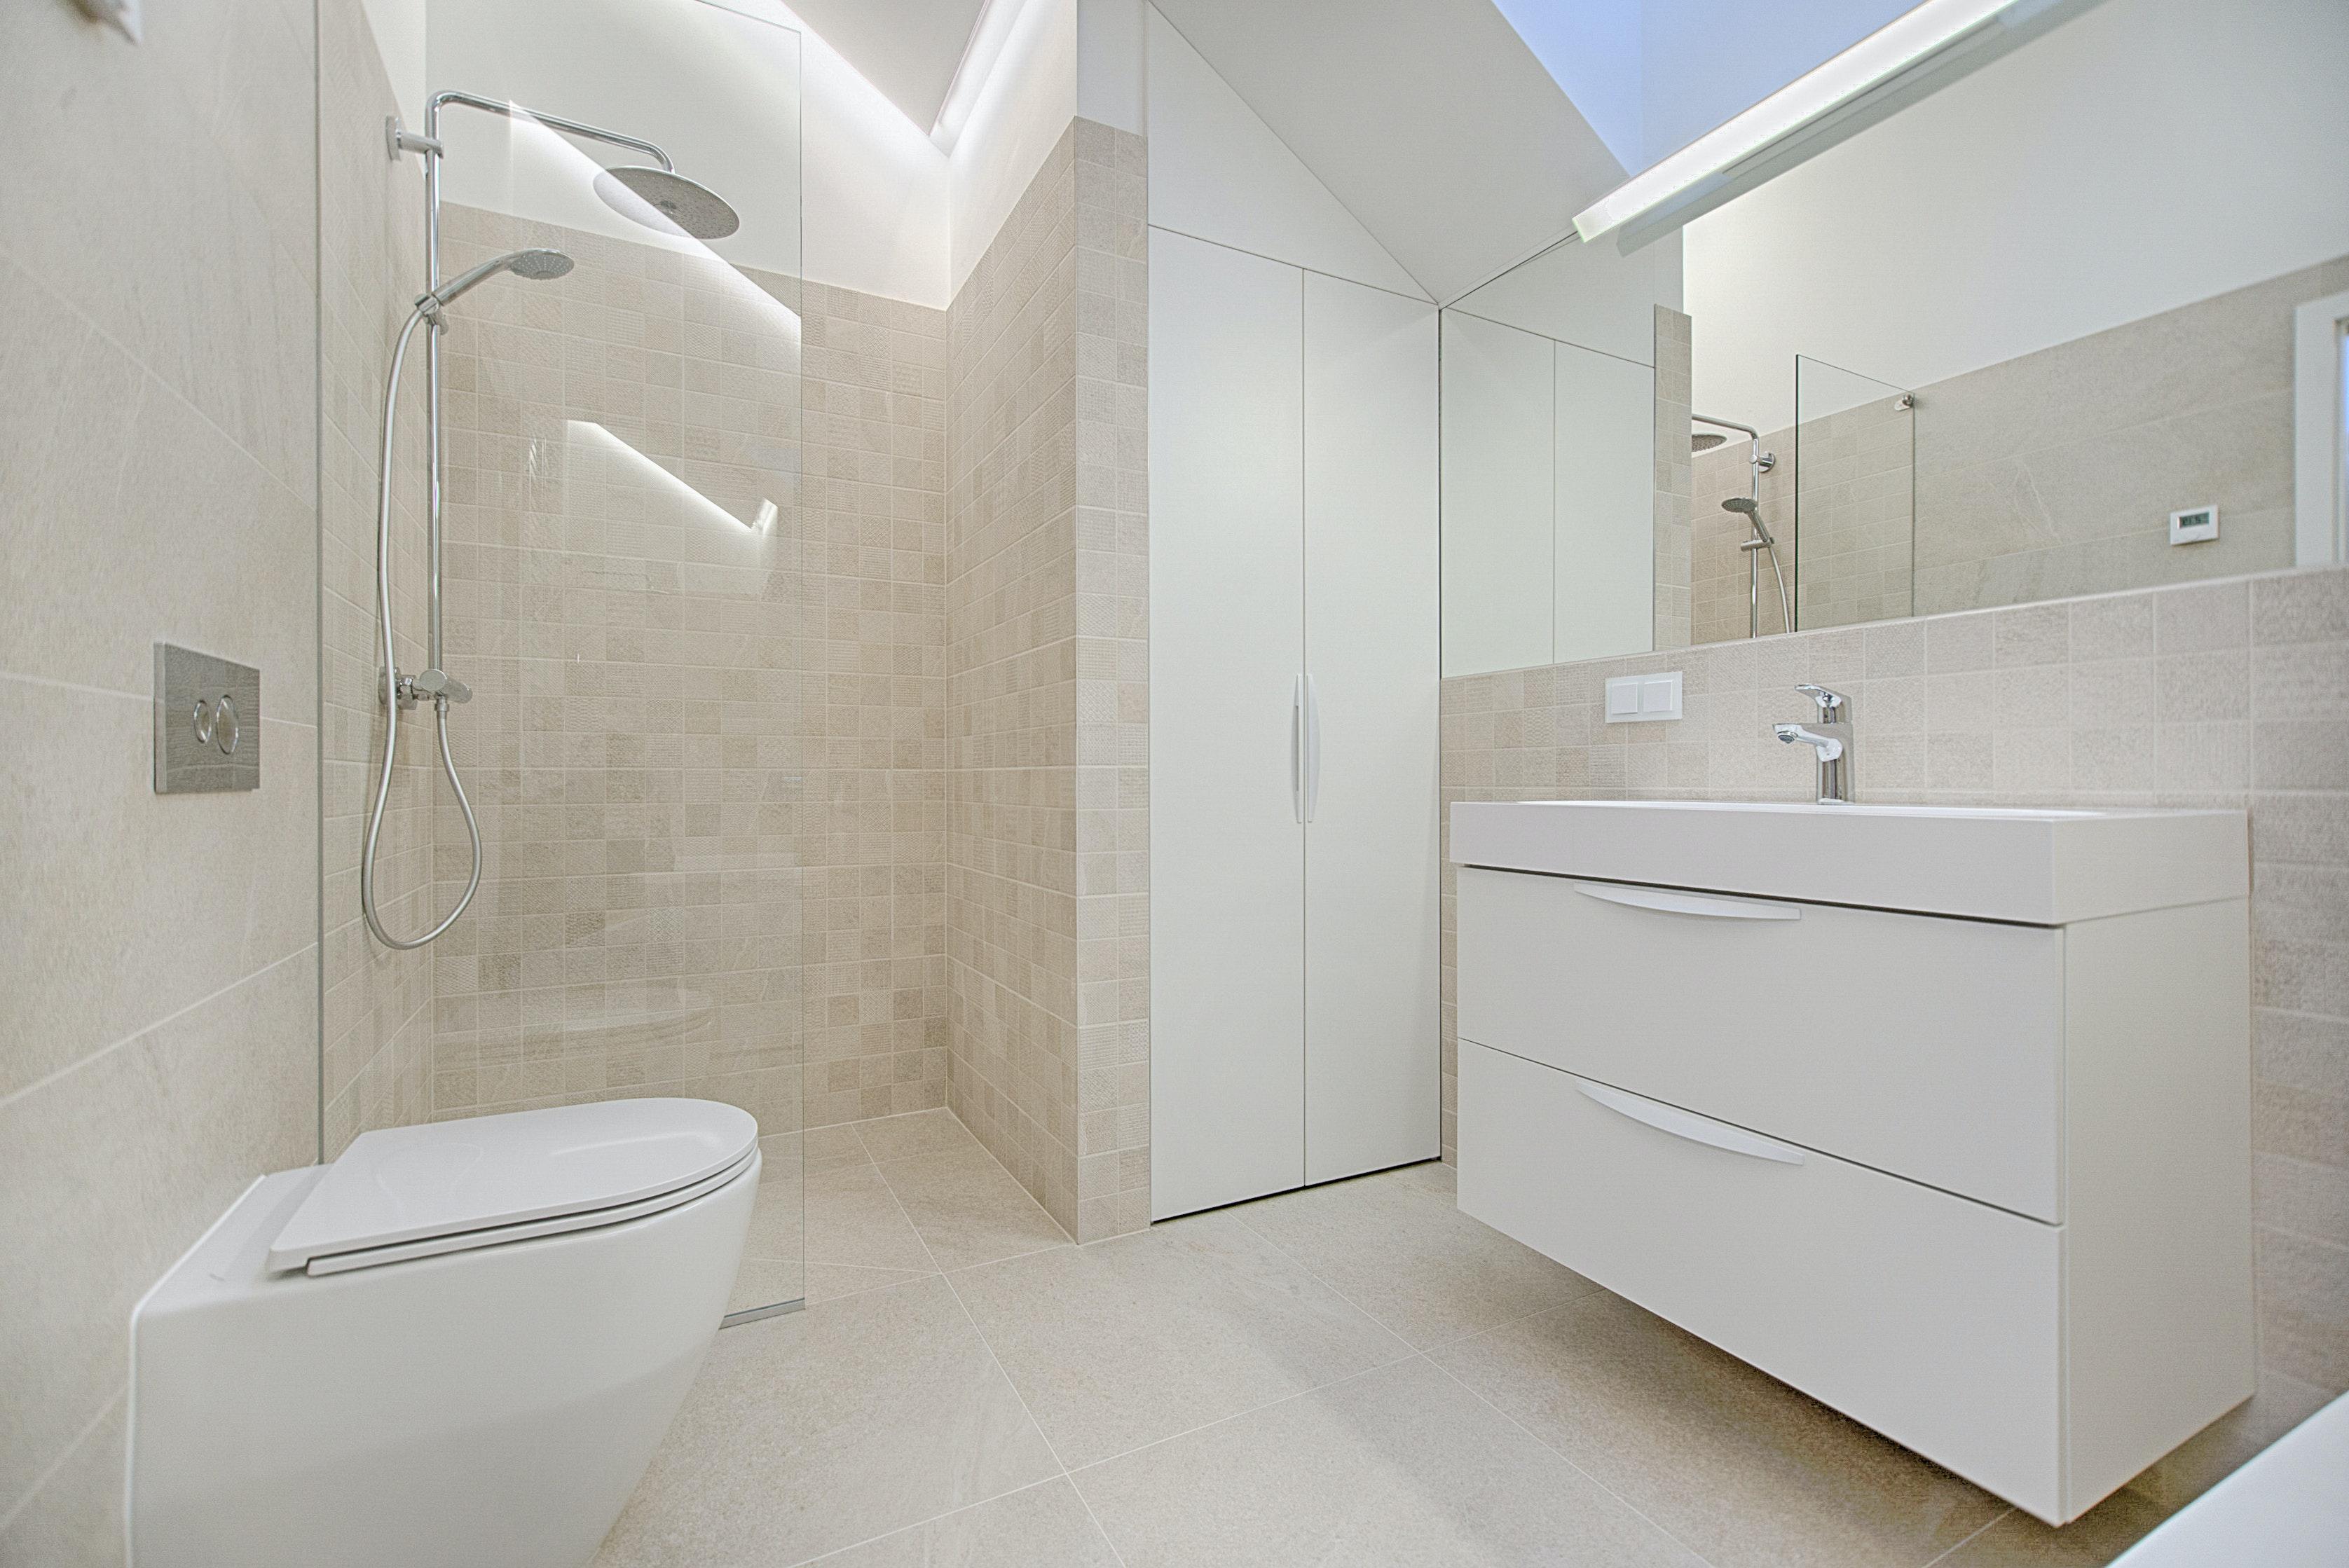 Salle de bain spacieuse et sécurisée